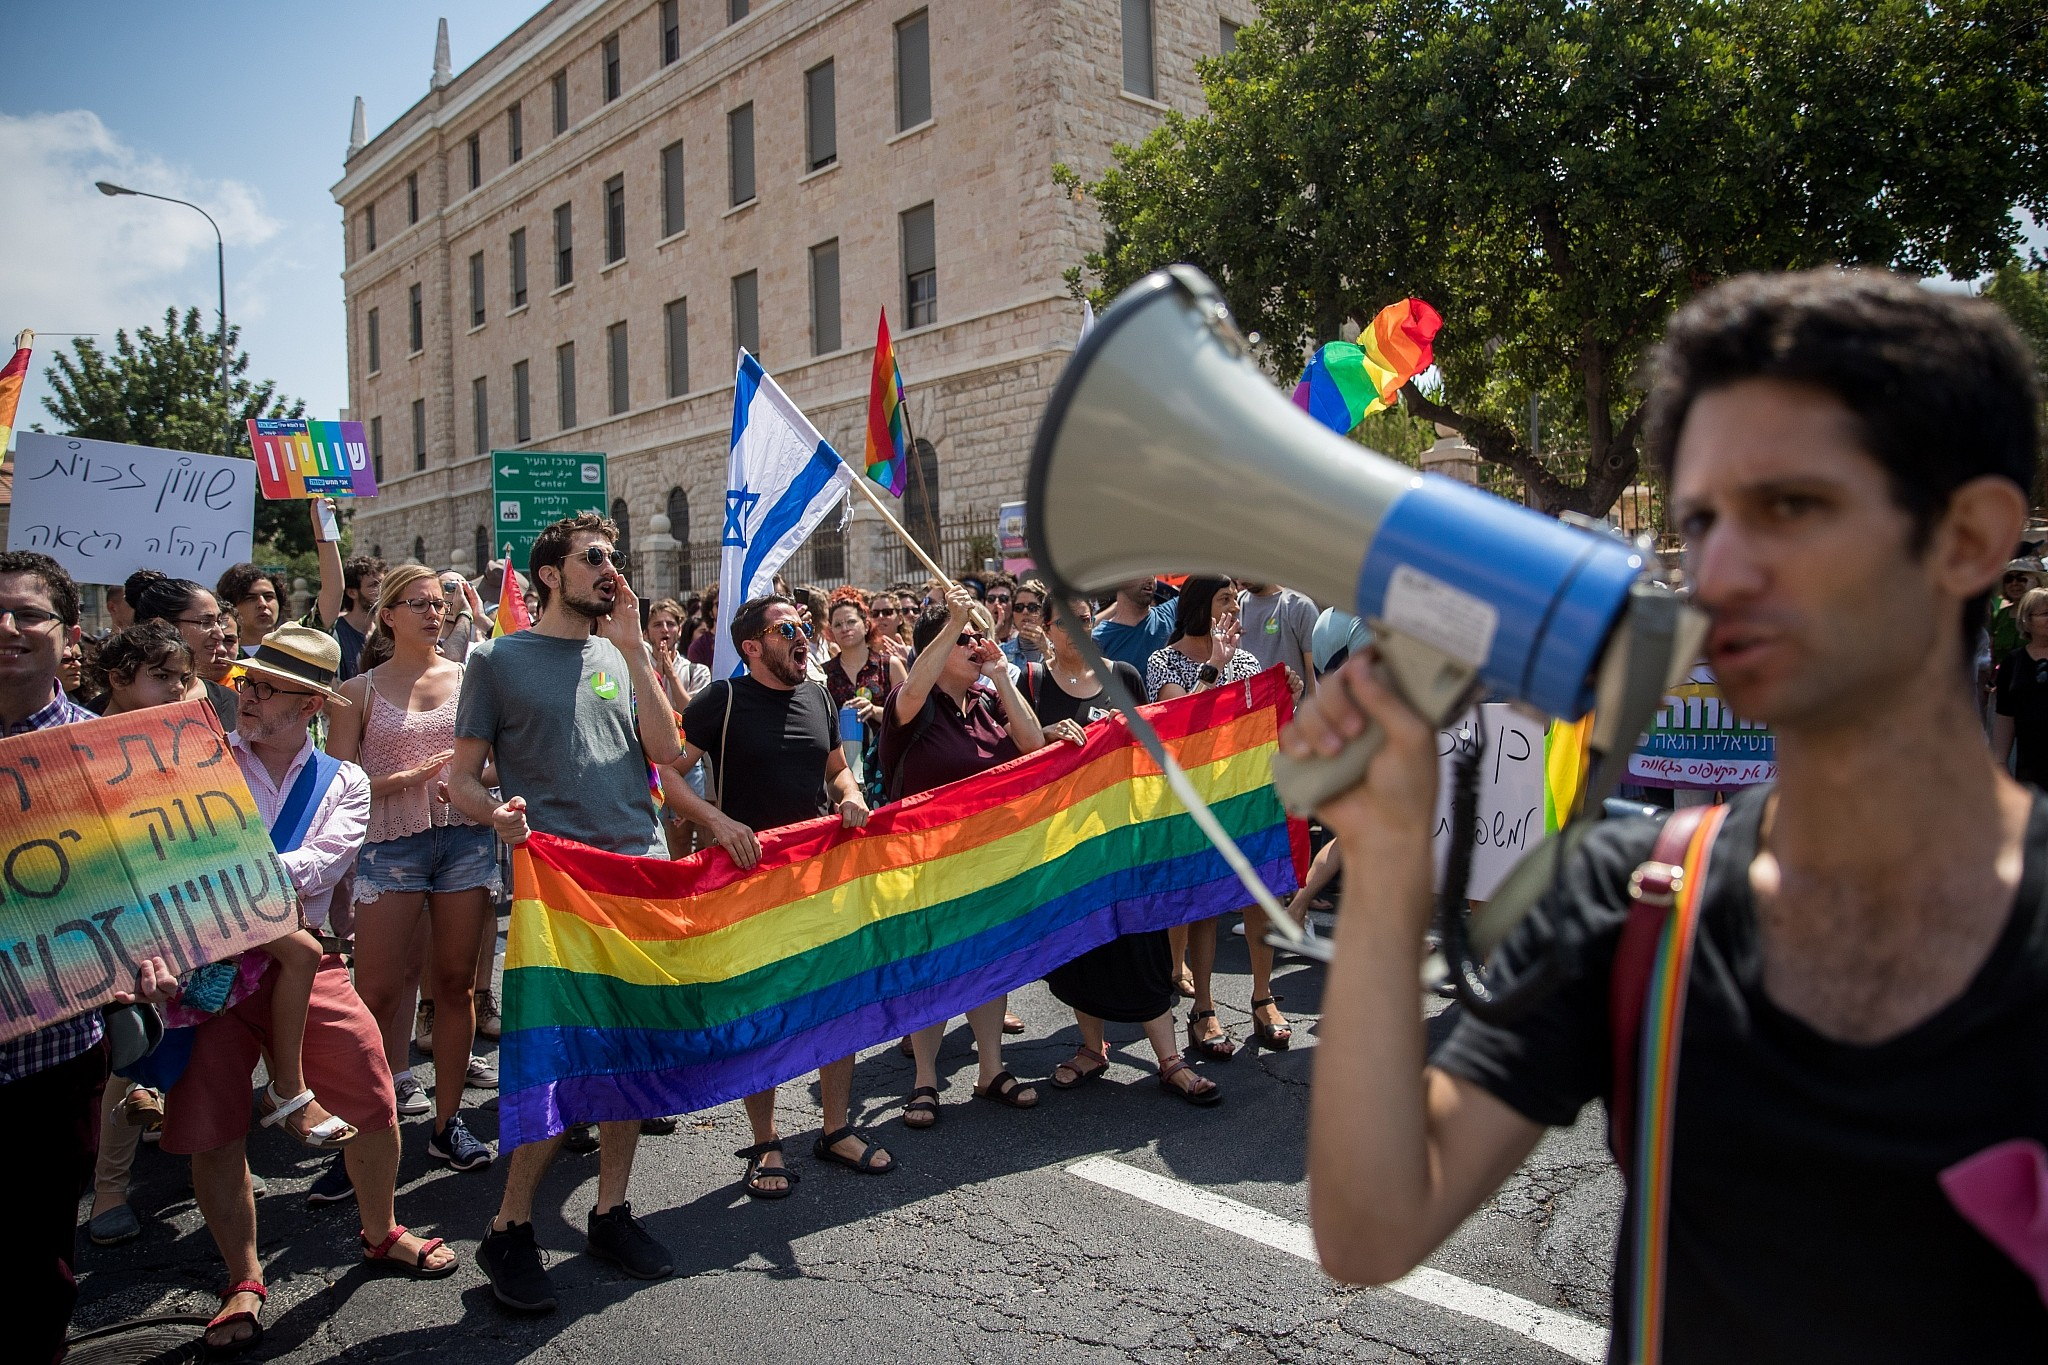 Sultan qaboos bin said homosexual advance